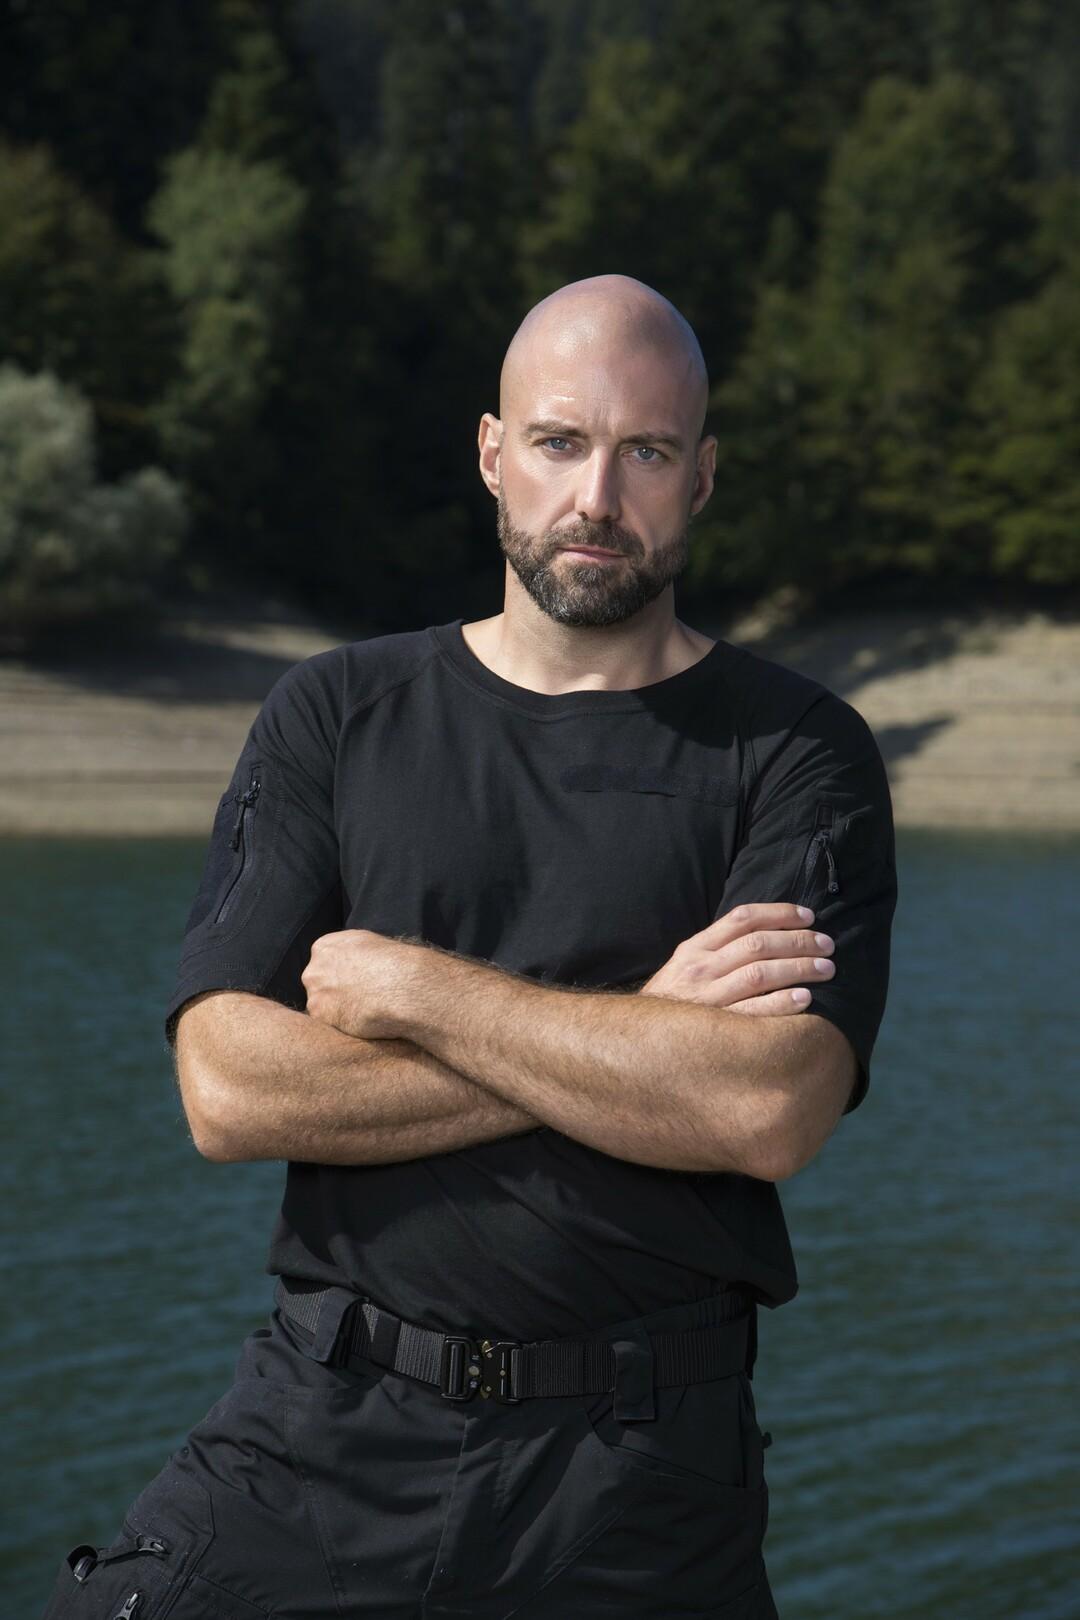 Julien Kottysch, 38, Berufssoldat